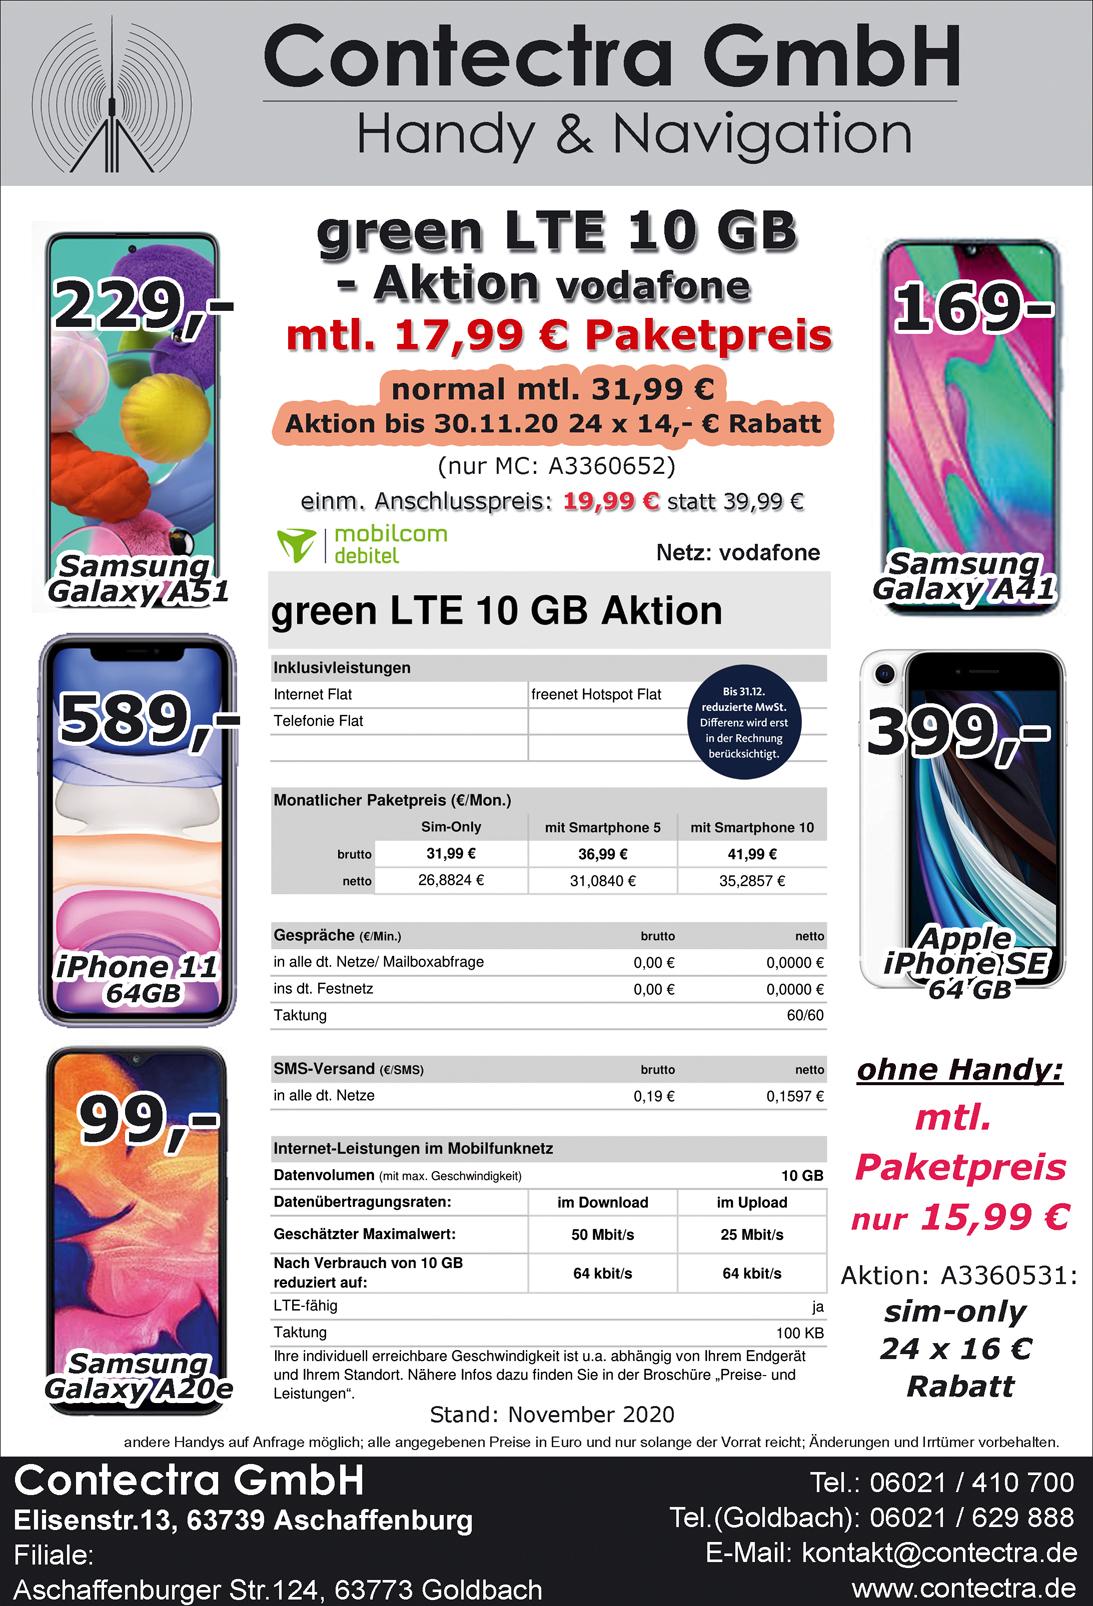 green 10 GB 15,99 € vodafone Nov2020 Kopie